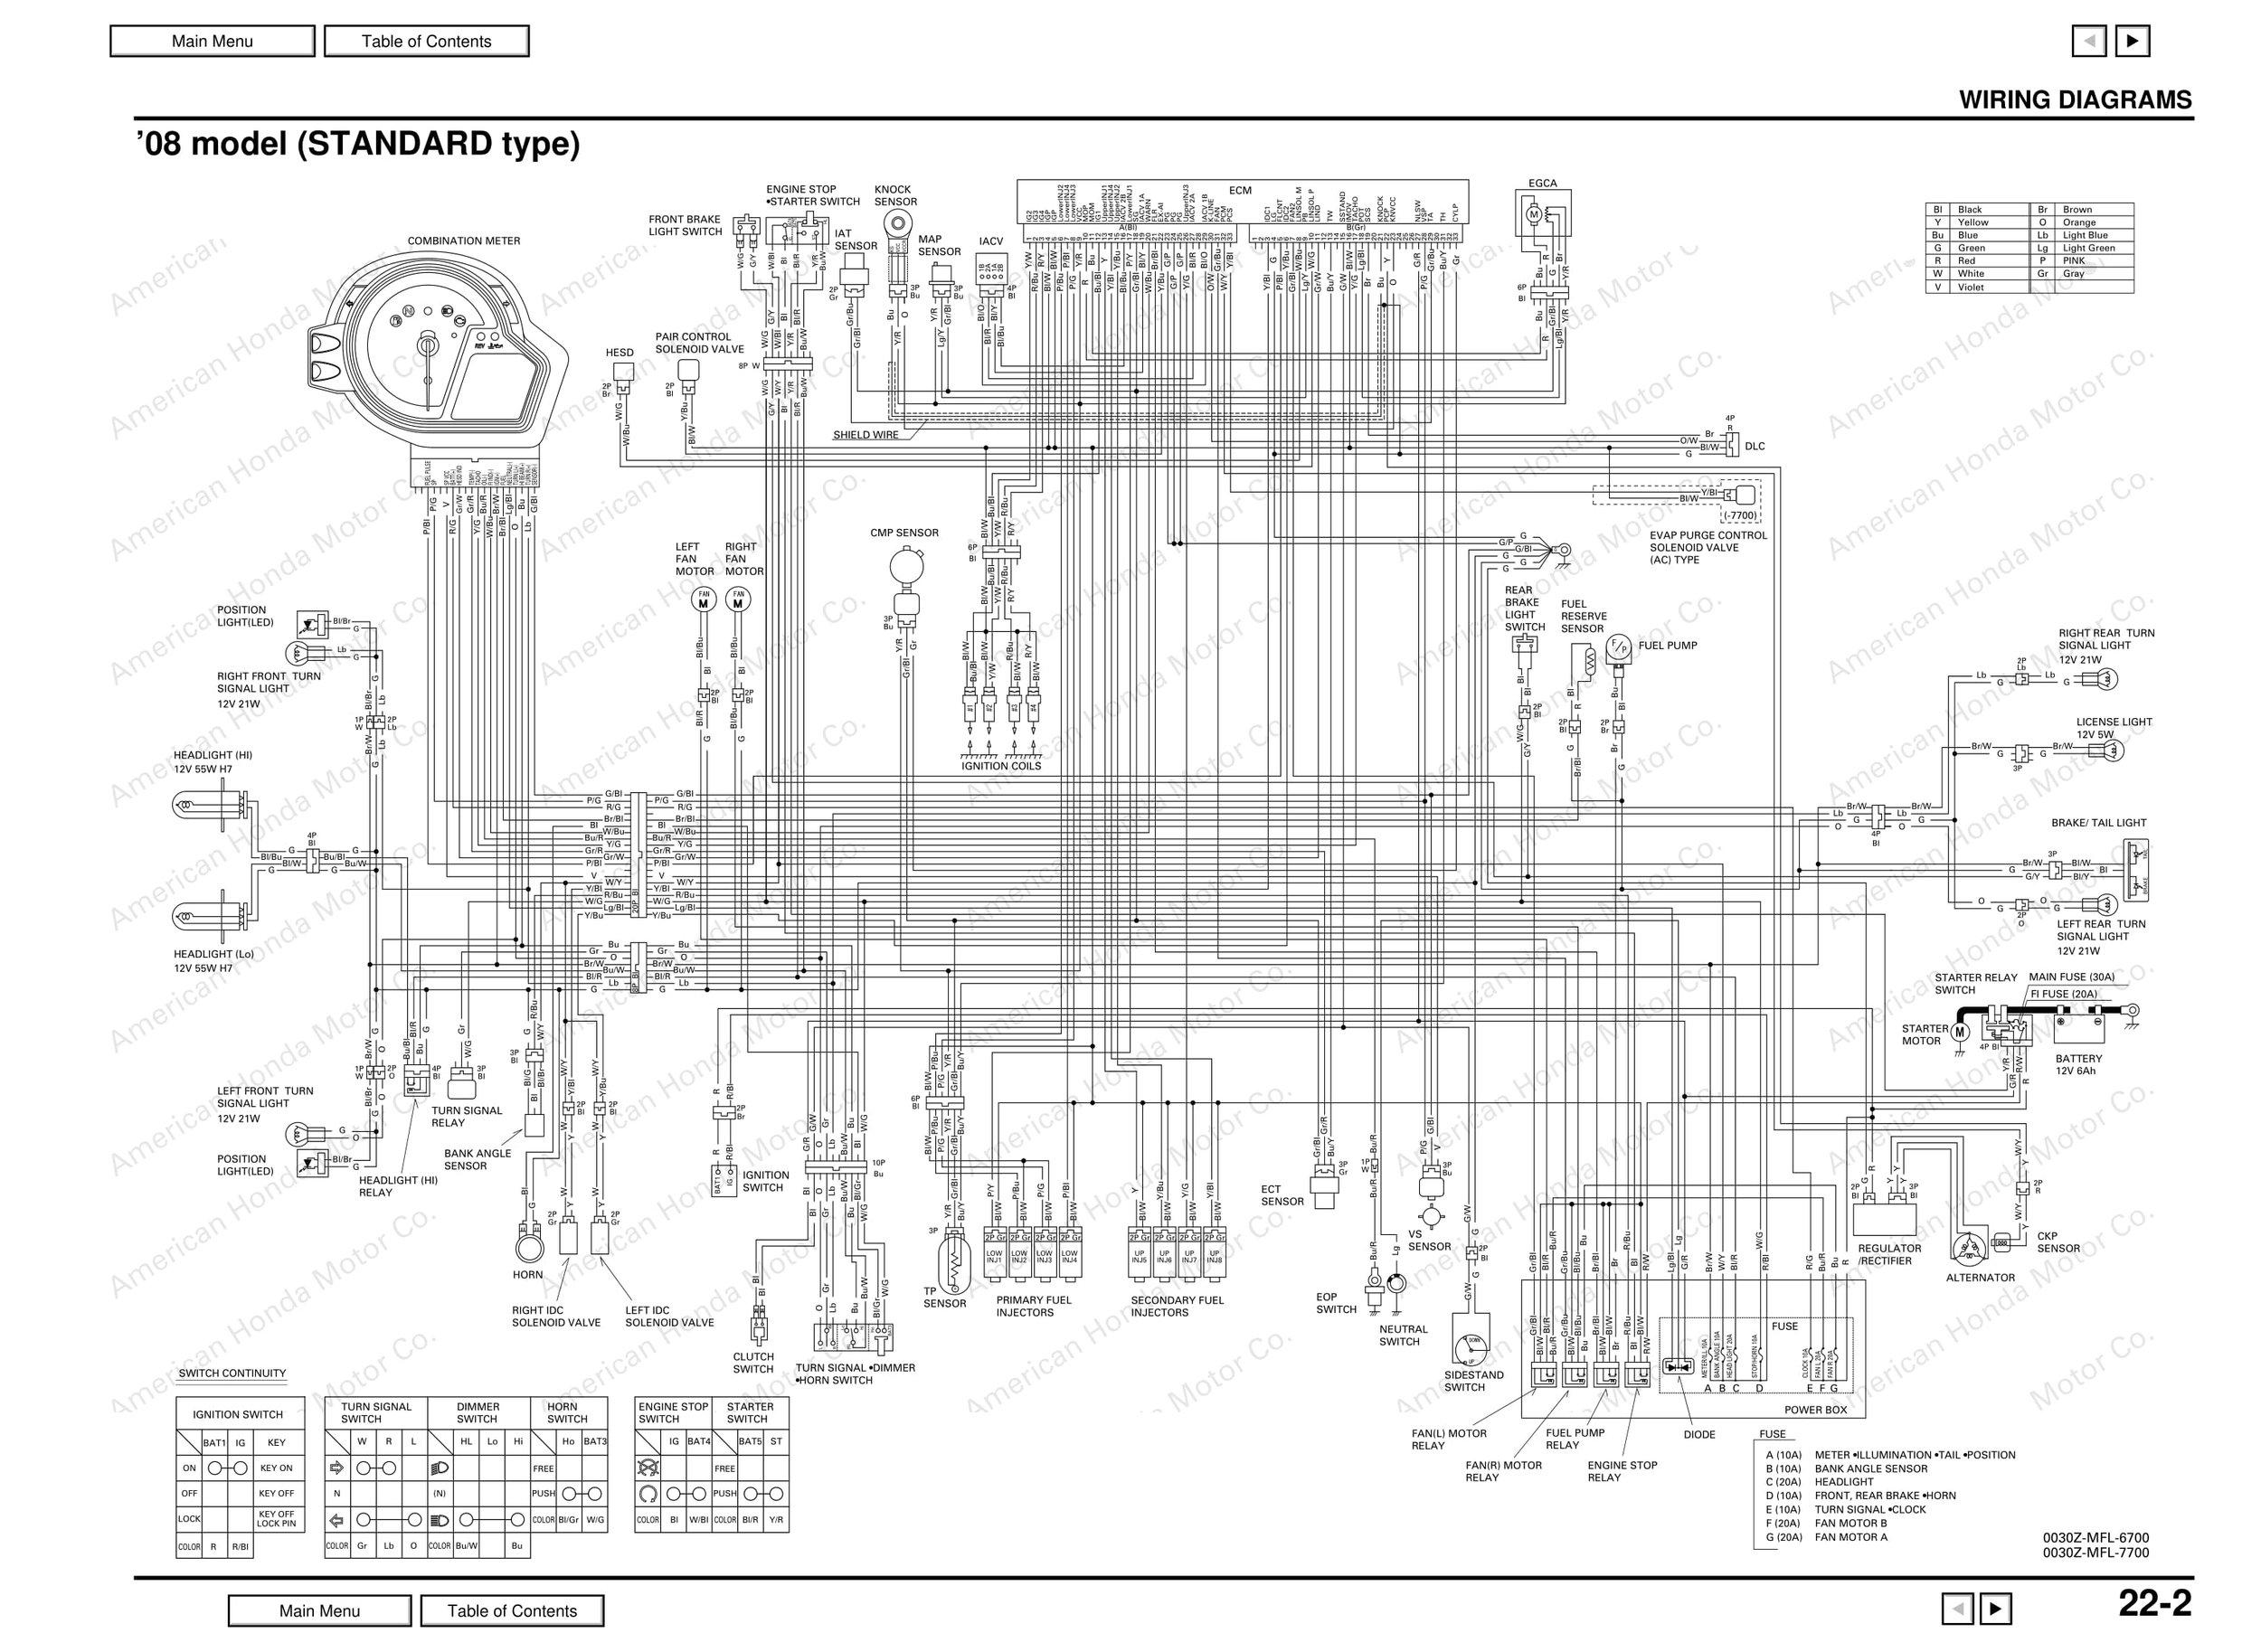 CJR Performance - CameronJonesRaacing.com on cbr 954 rr, cbr 900 rr, honda 1000 rr, cbr 250 rr, cbr 600 rr, cbr 929 rr,